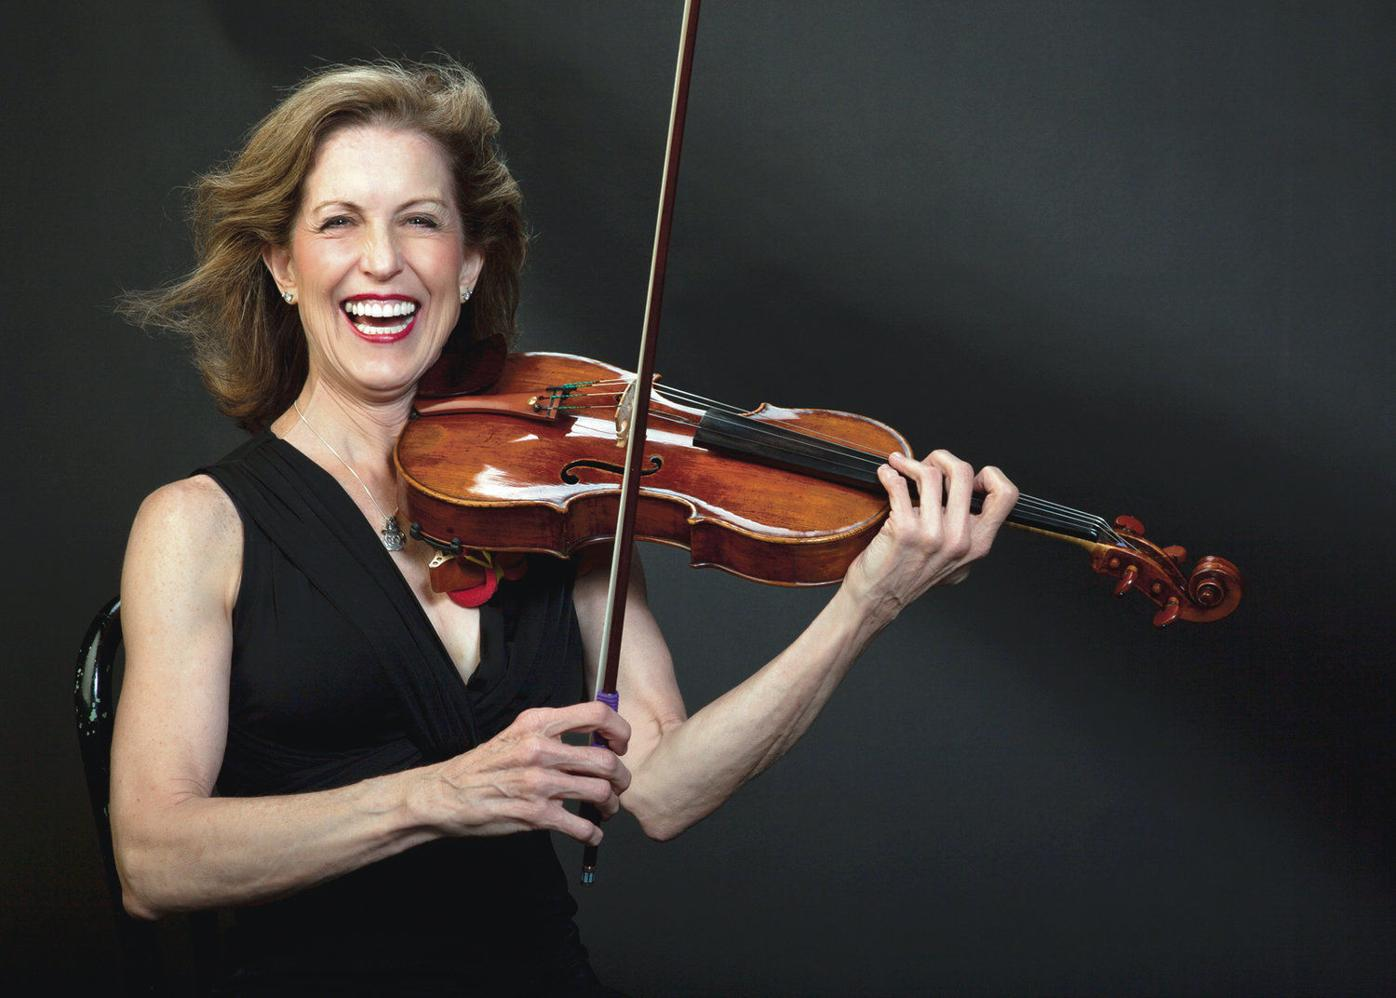 Concerts bring instrument-maker's art to life